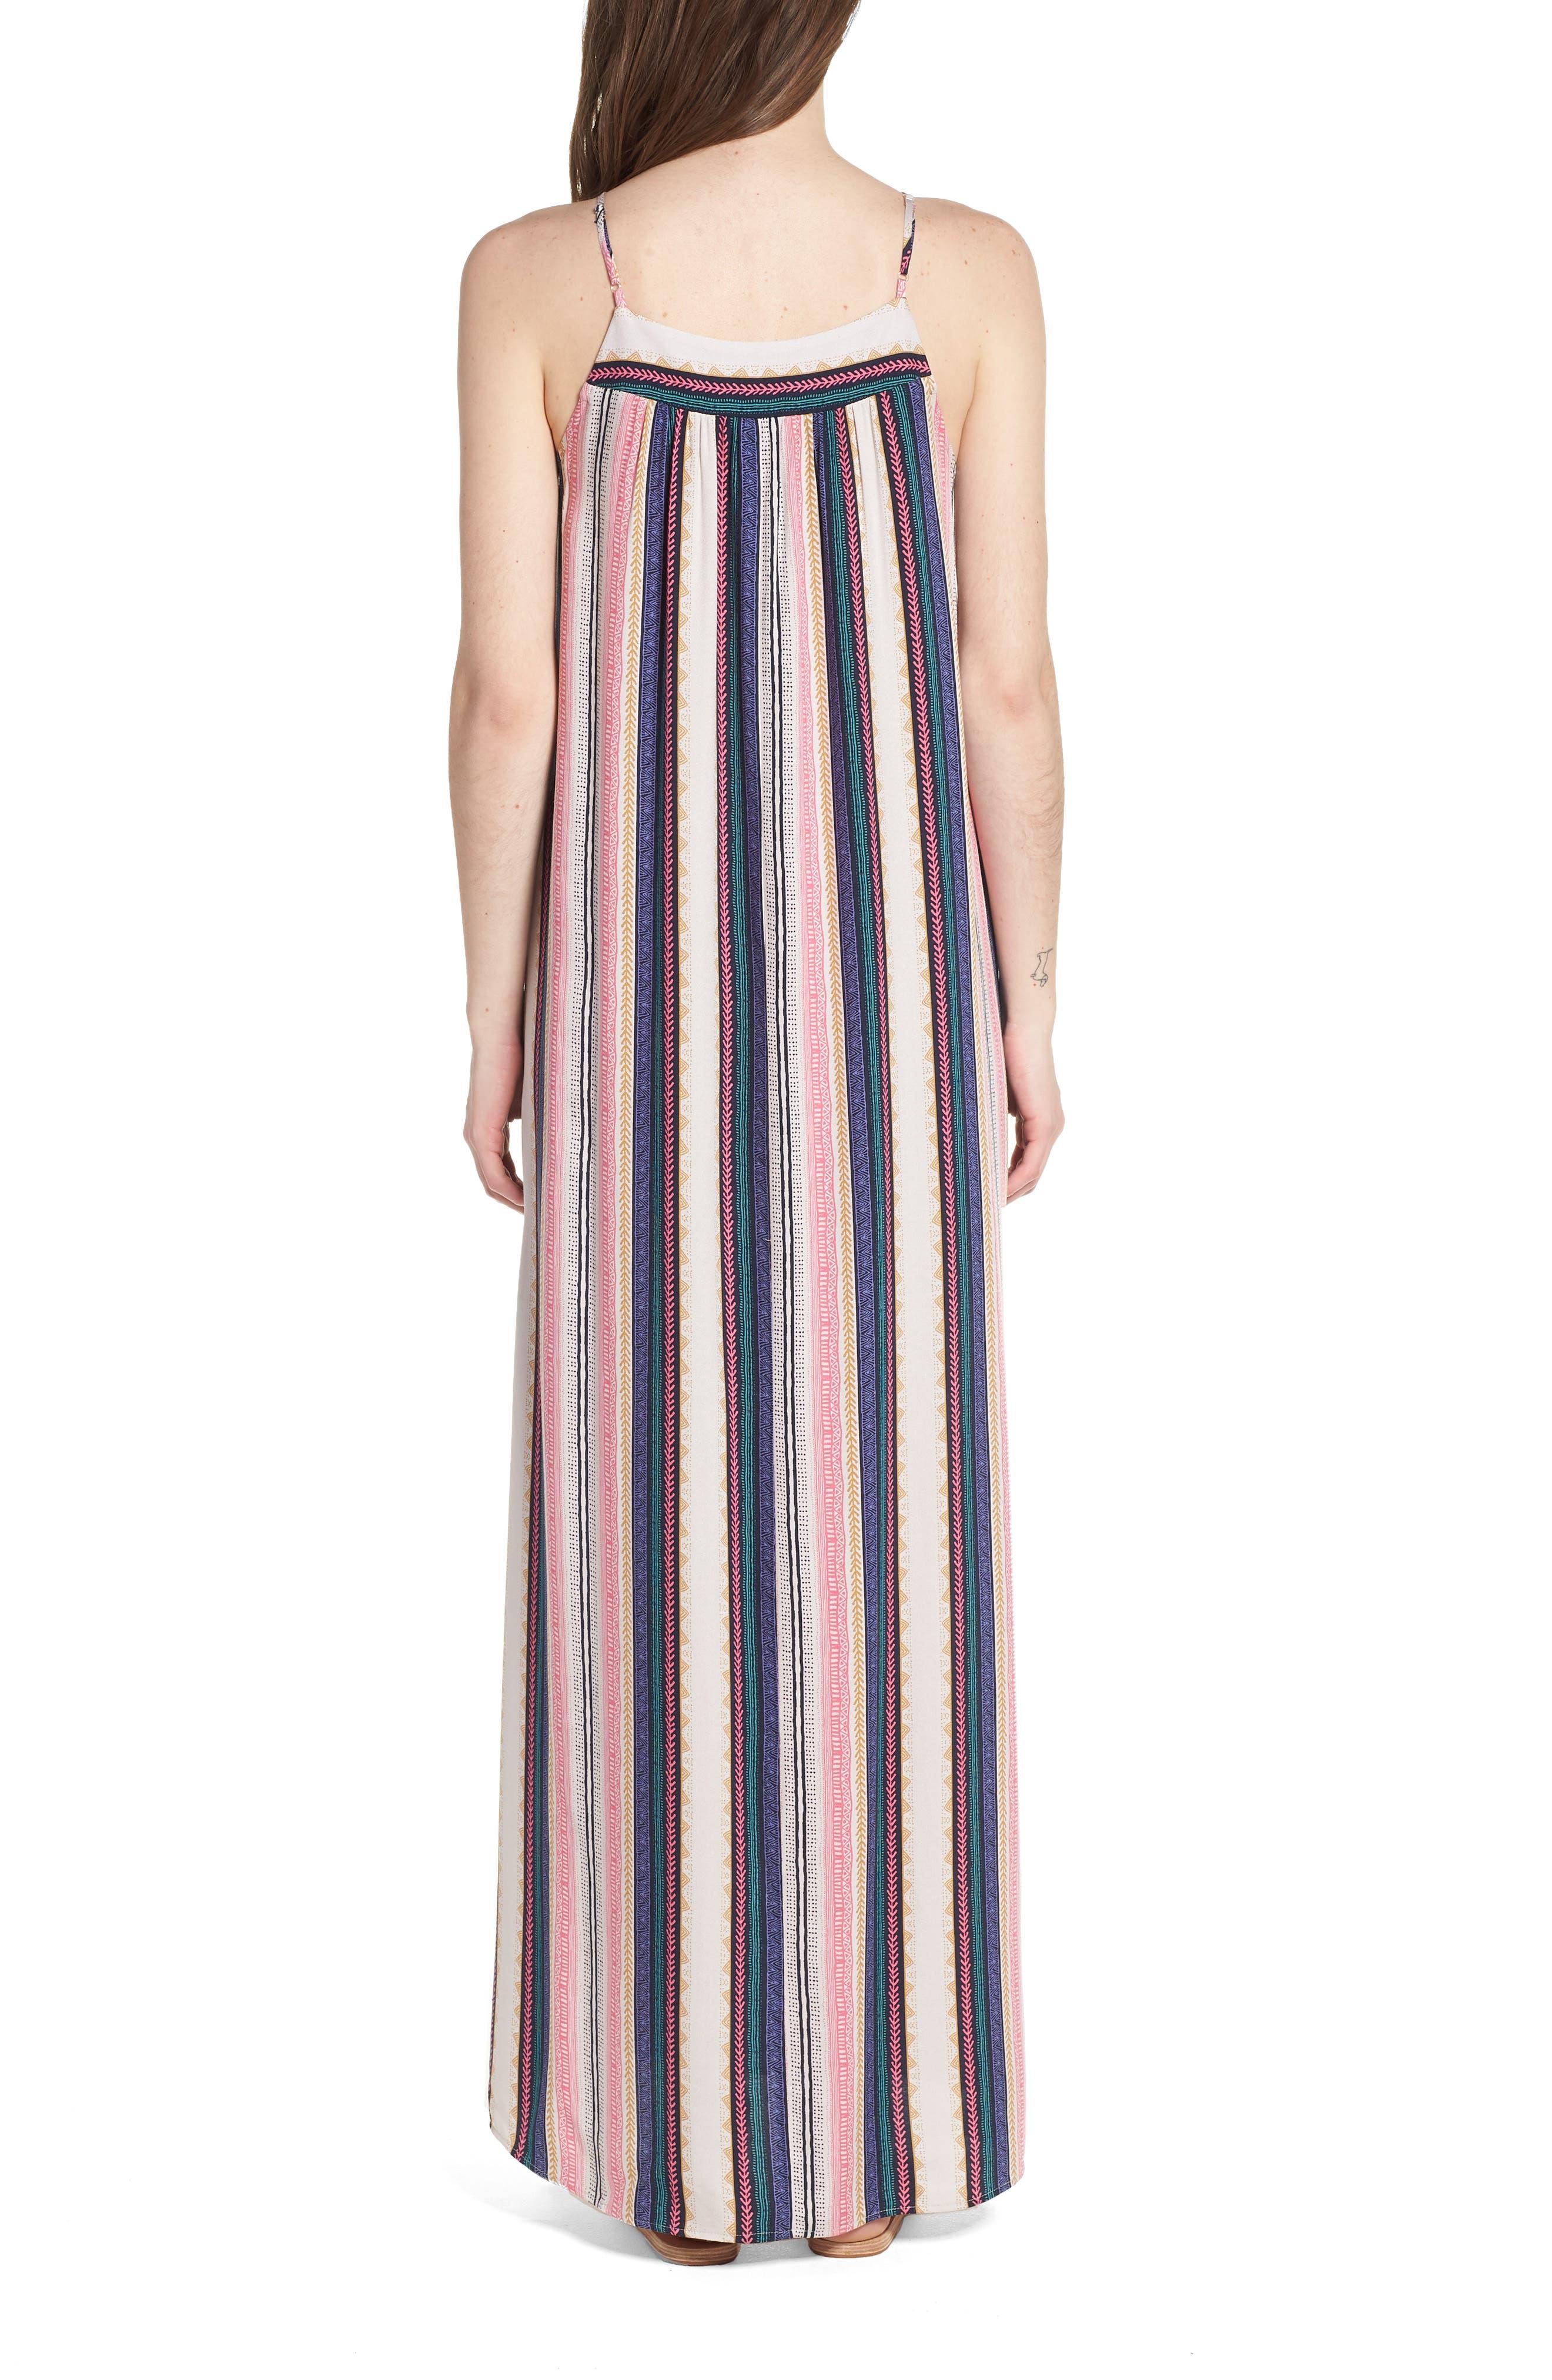 ONE CLOTHING,                             Stripe Maxi Dress,                             Alternate thumbnail 2, color,                             650